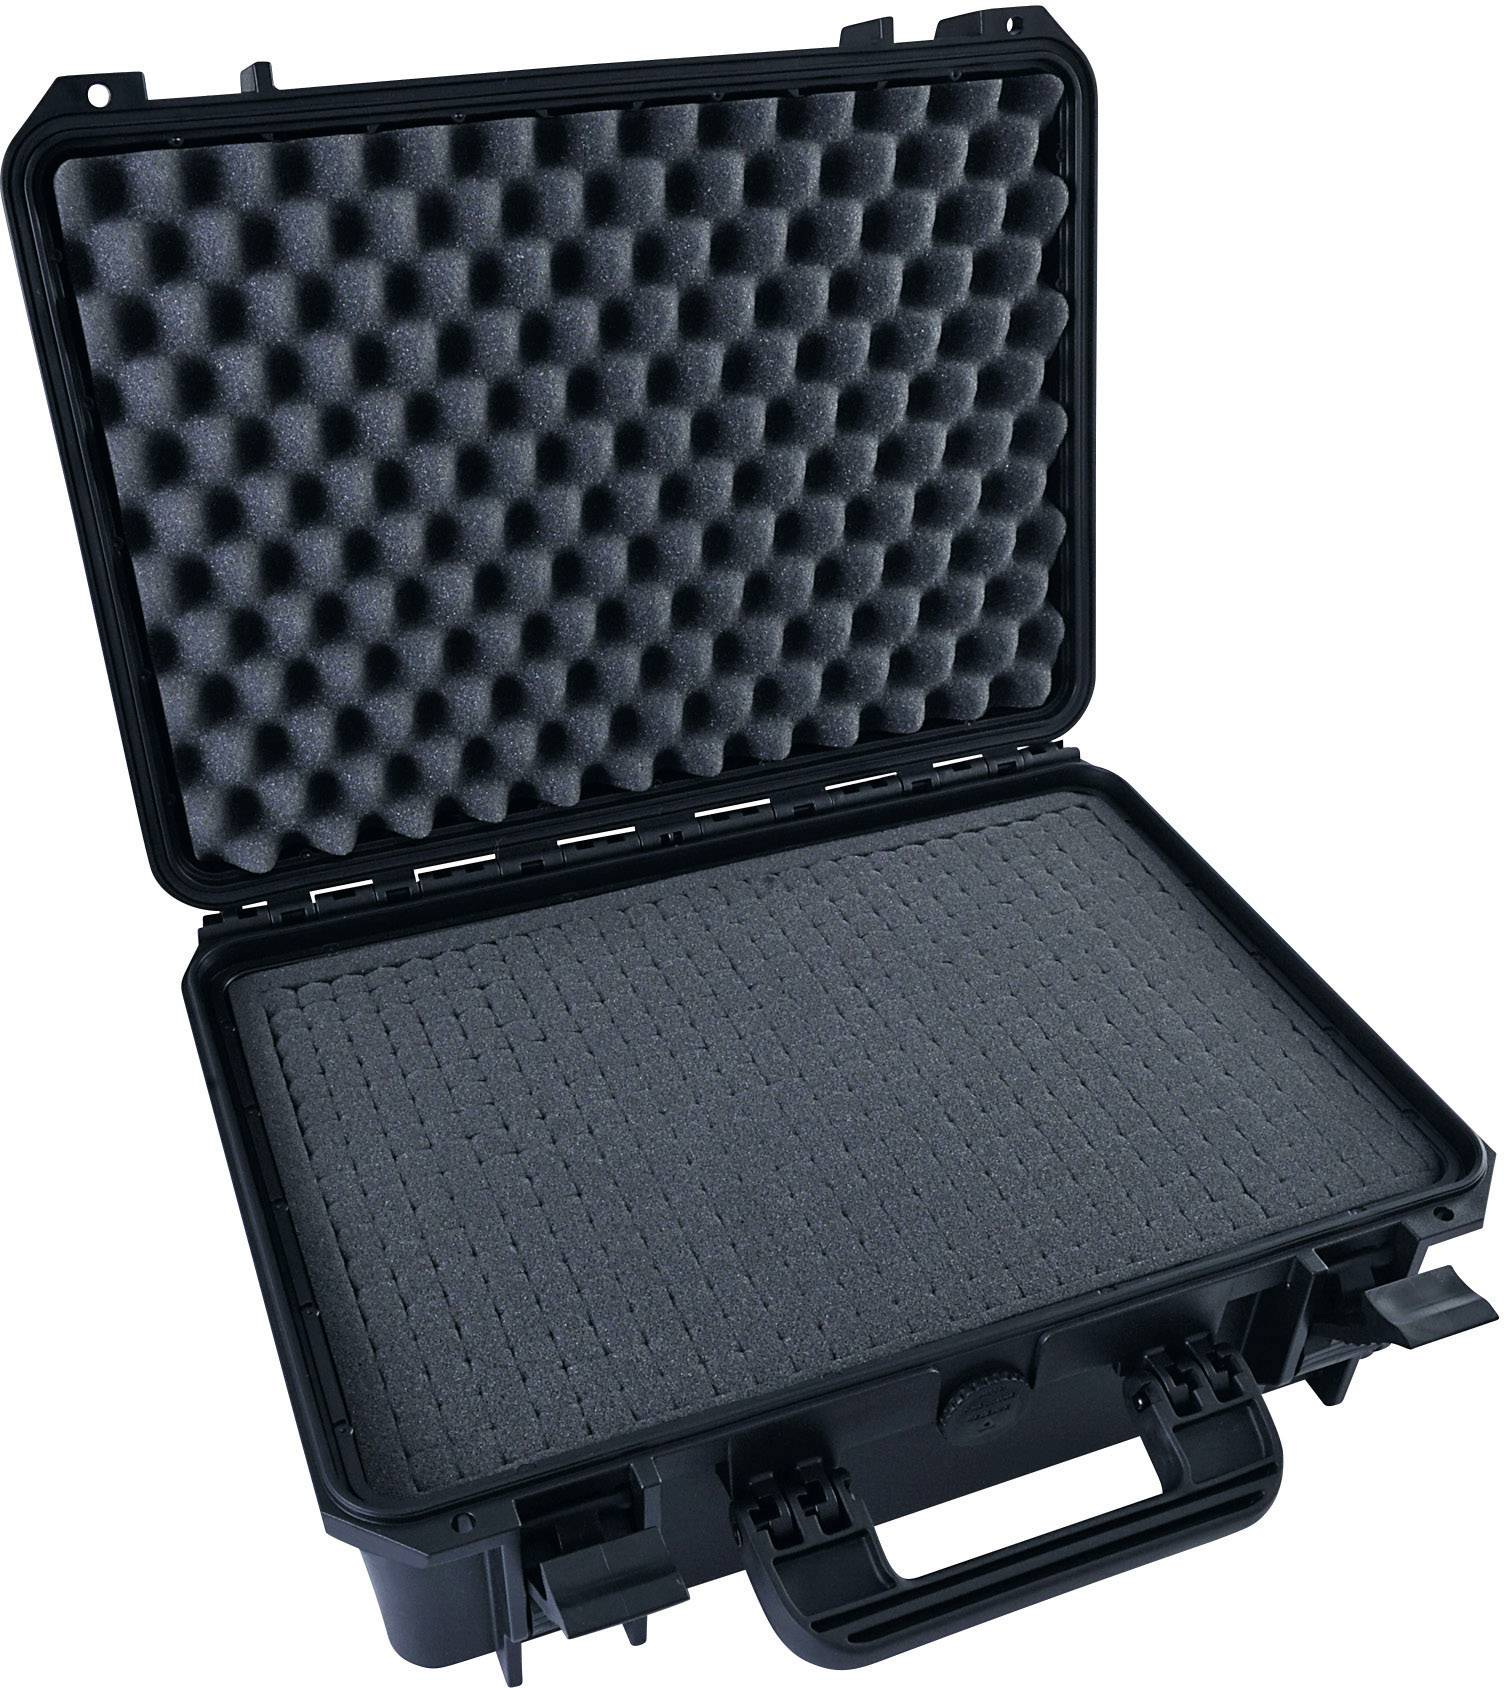 Kufor Xenotec MAX430S MAX430S 464 x 366 x 176 mm